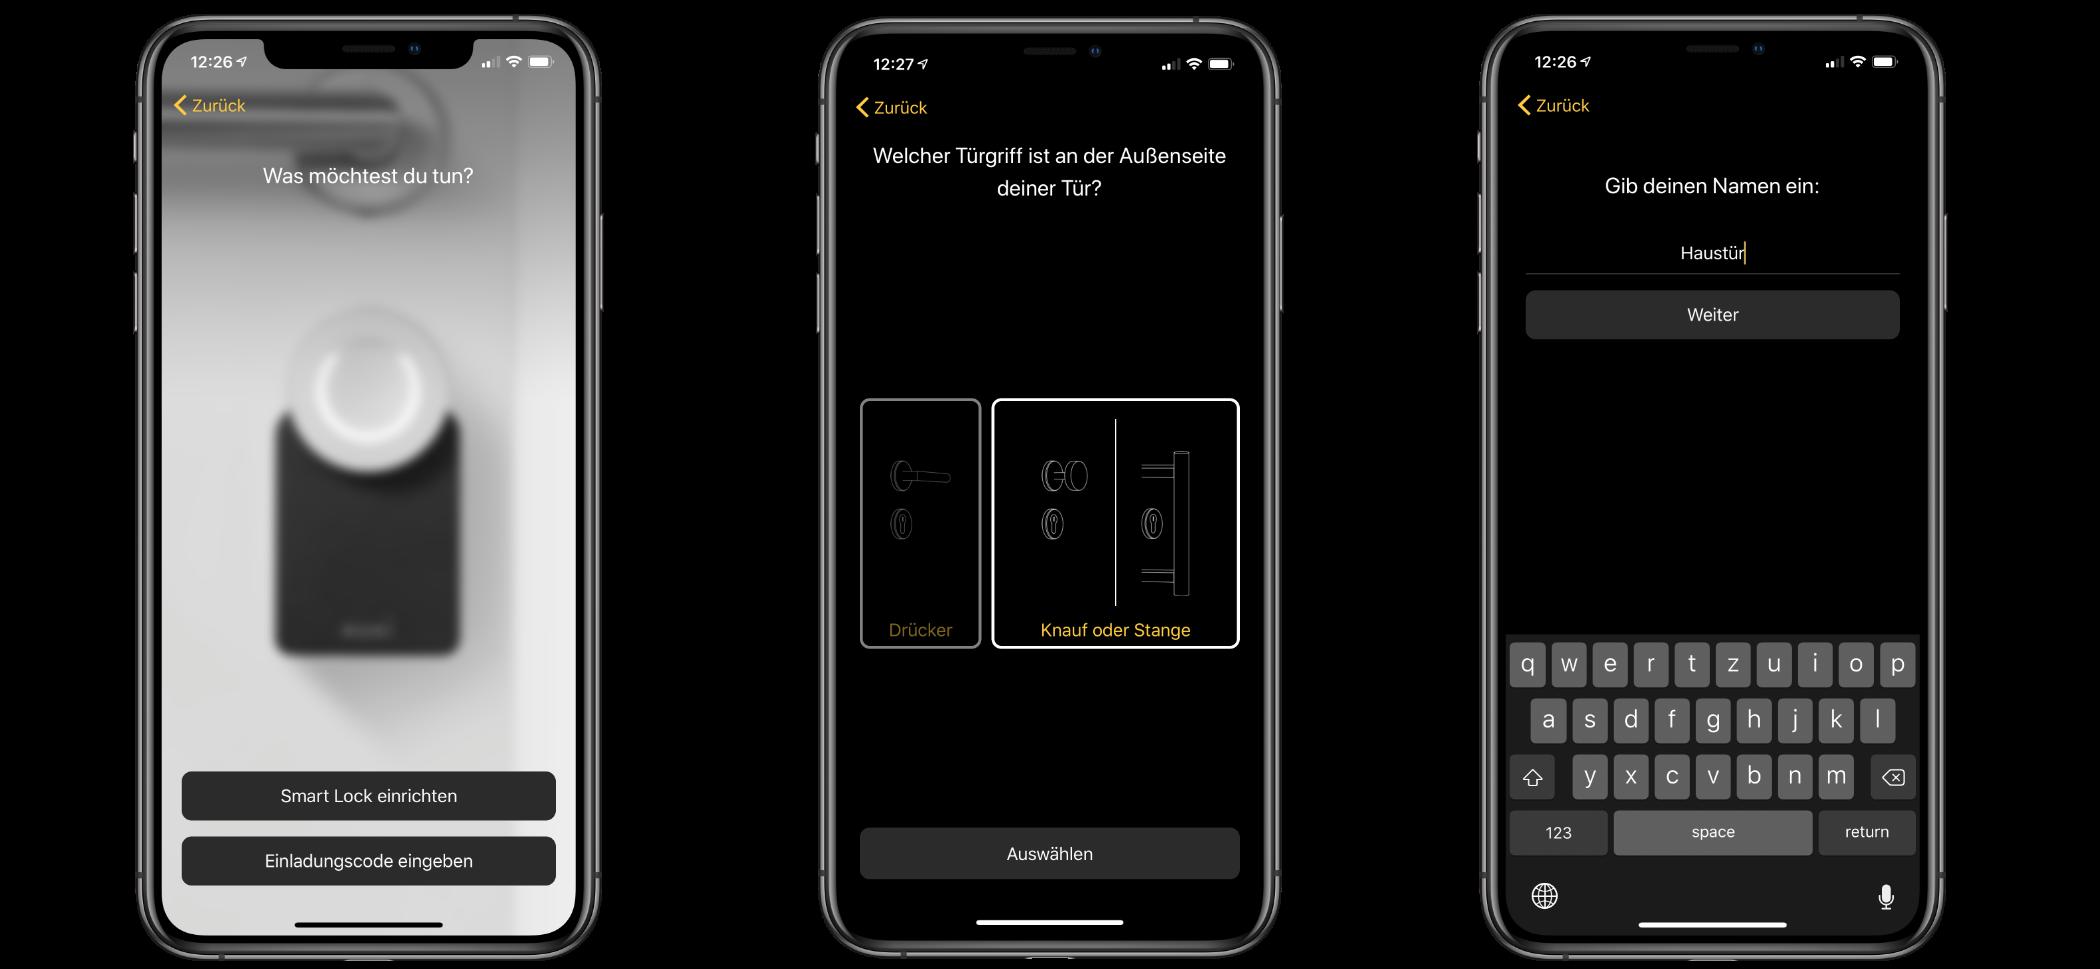 Nuki_HomeKit_Türschloss_SmartHome_Review5 Nuki 2.0 mit Apple HomeKit - das smarte Türschloss